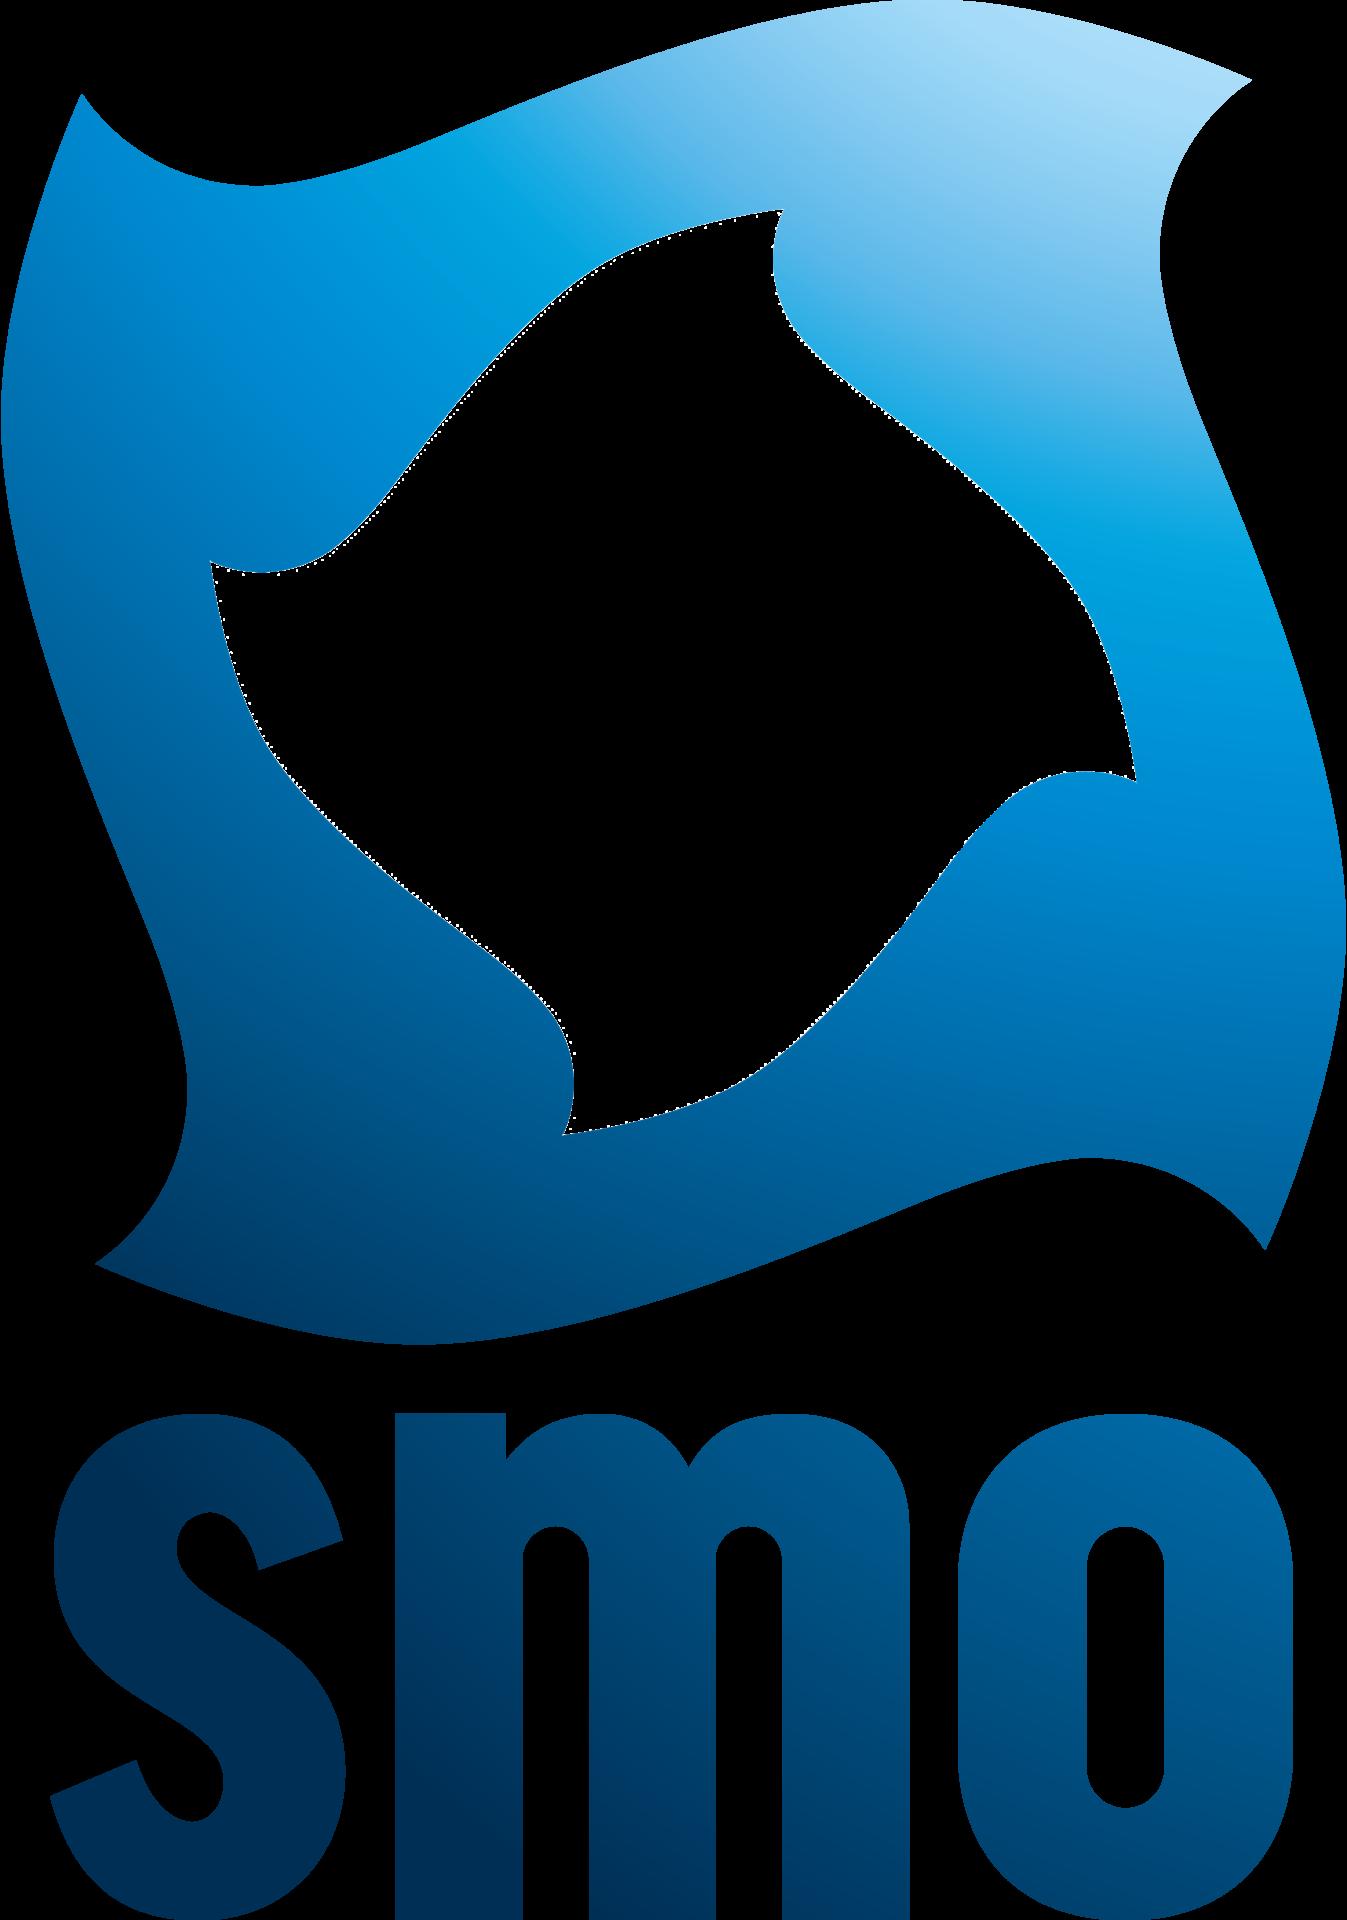 SMO-logo-png-13